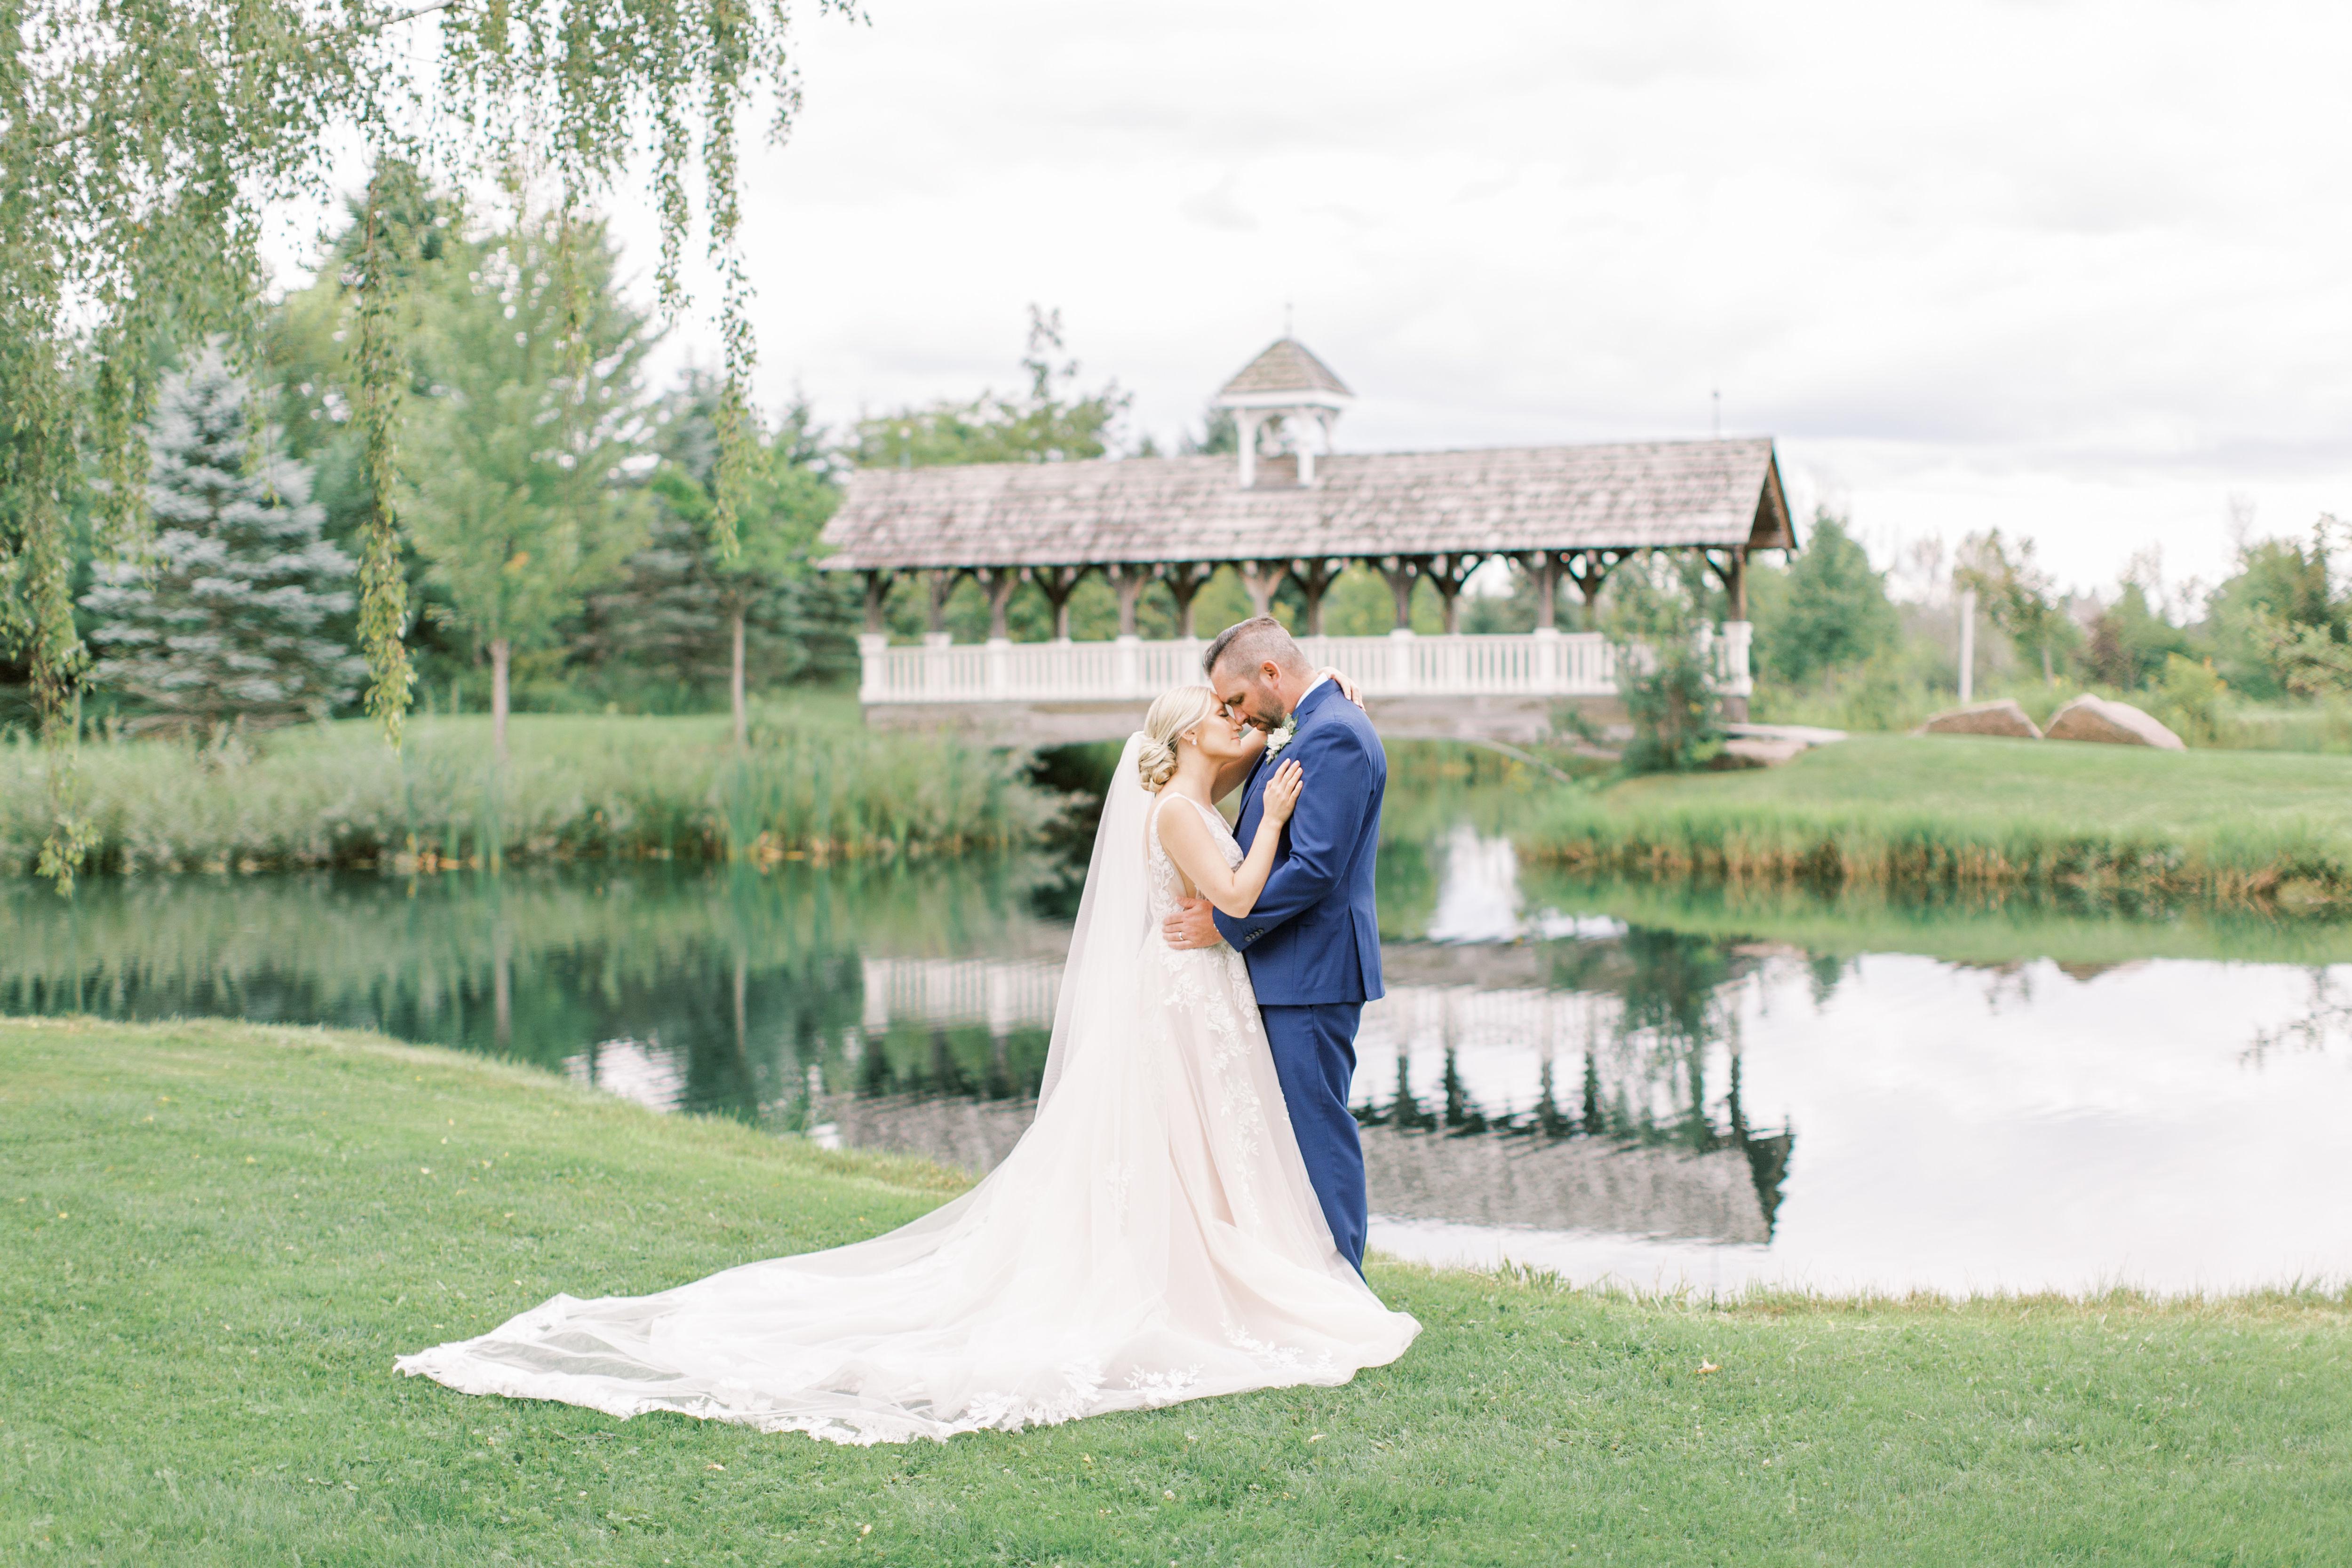 Kaitlyn + Grant | Orillia, Canada | Belcroft Estates